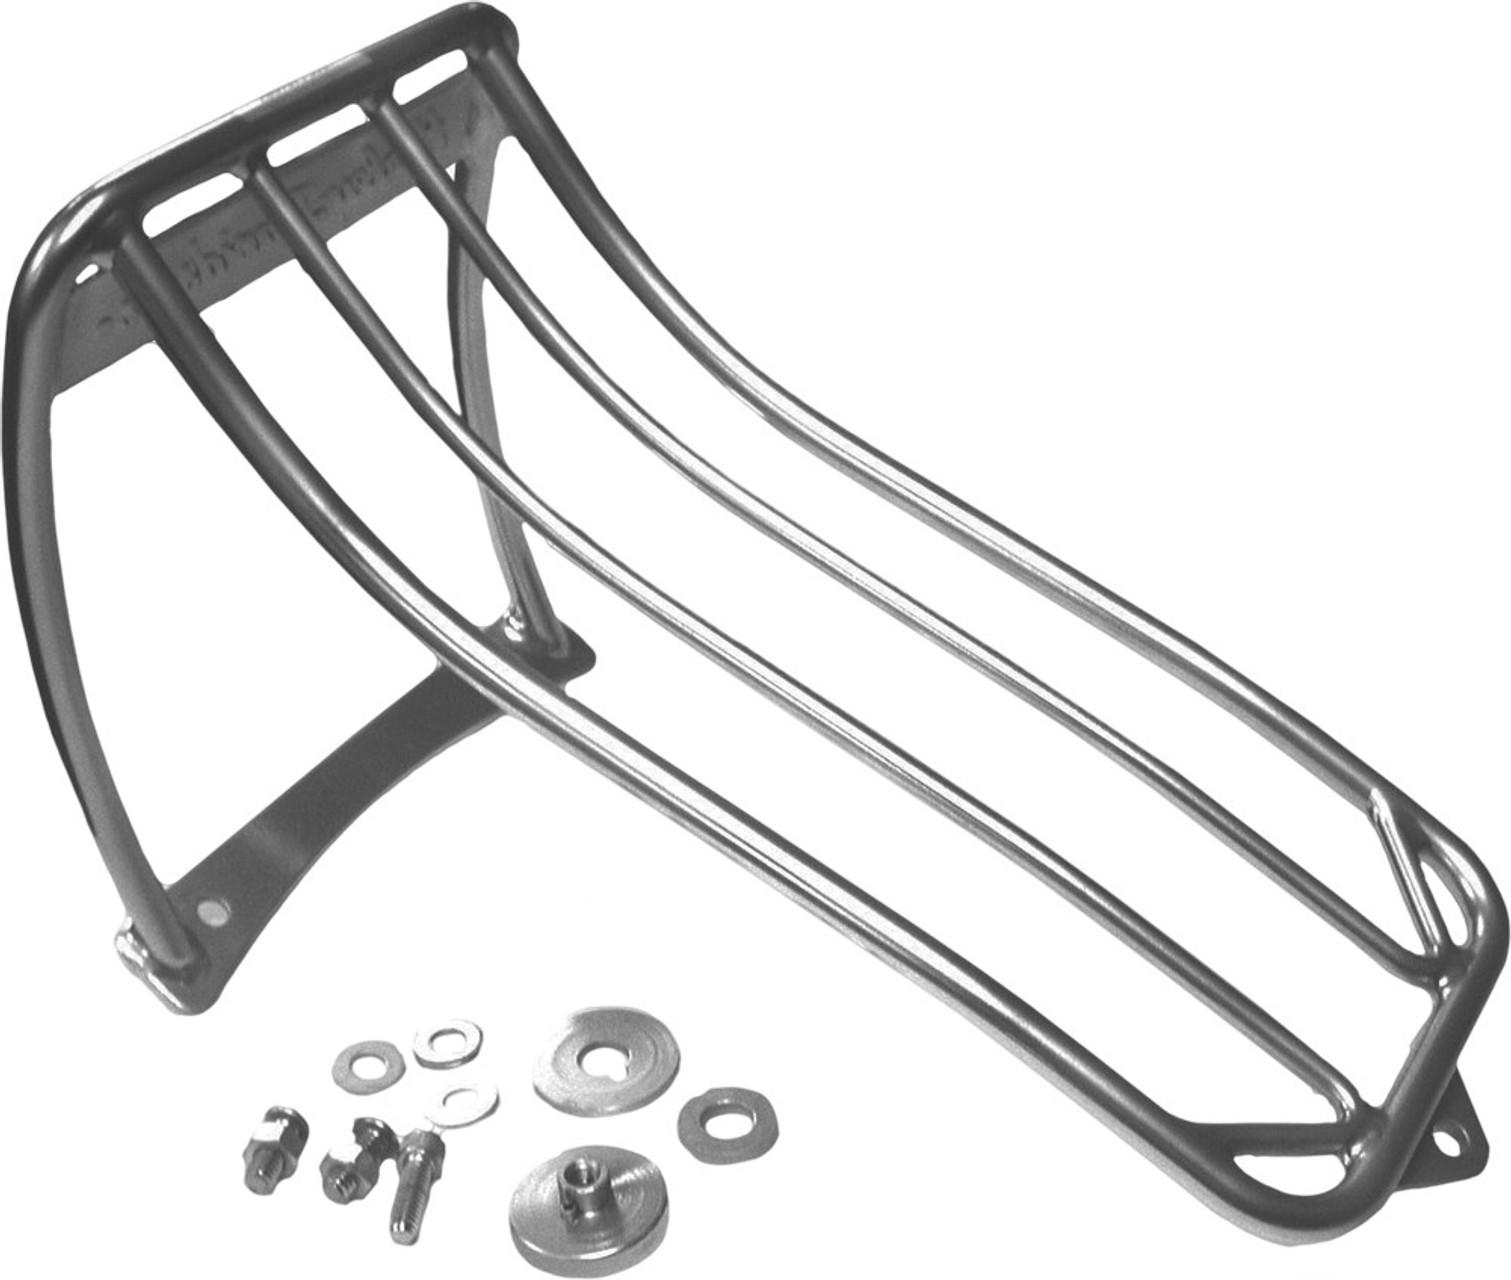 Harddrive 77-0069 Chrome Solo Luggage Rack